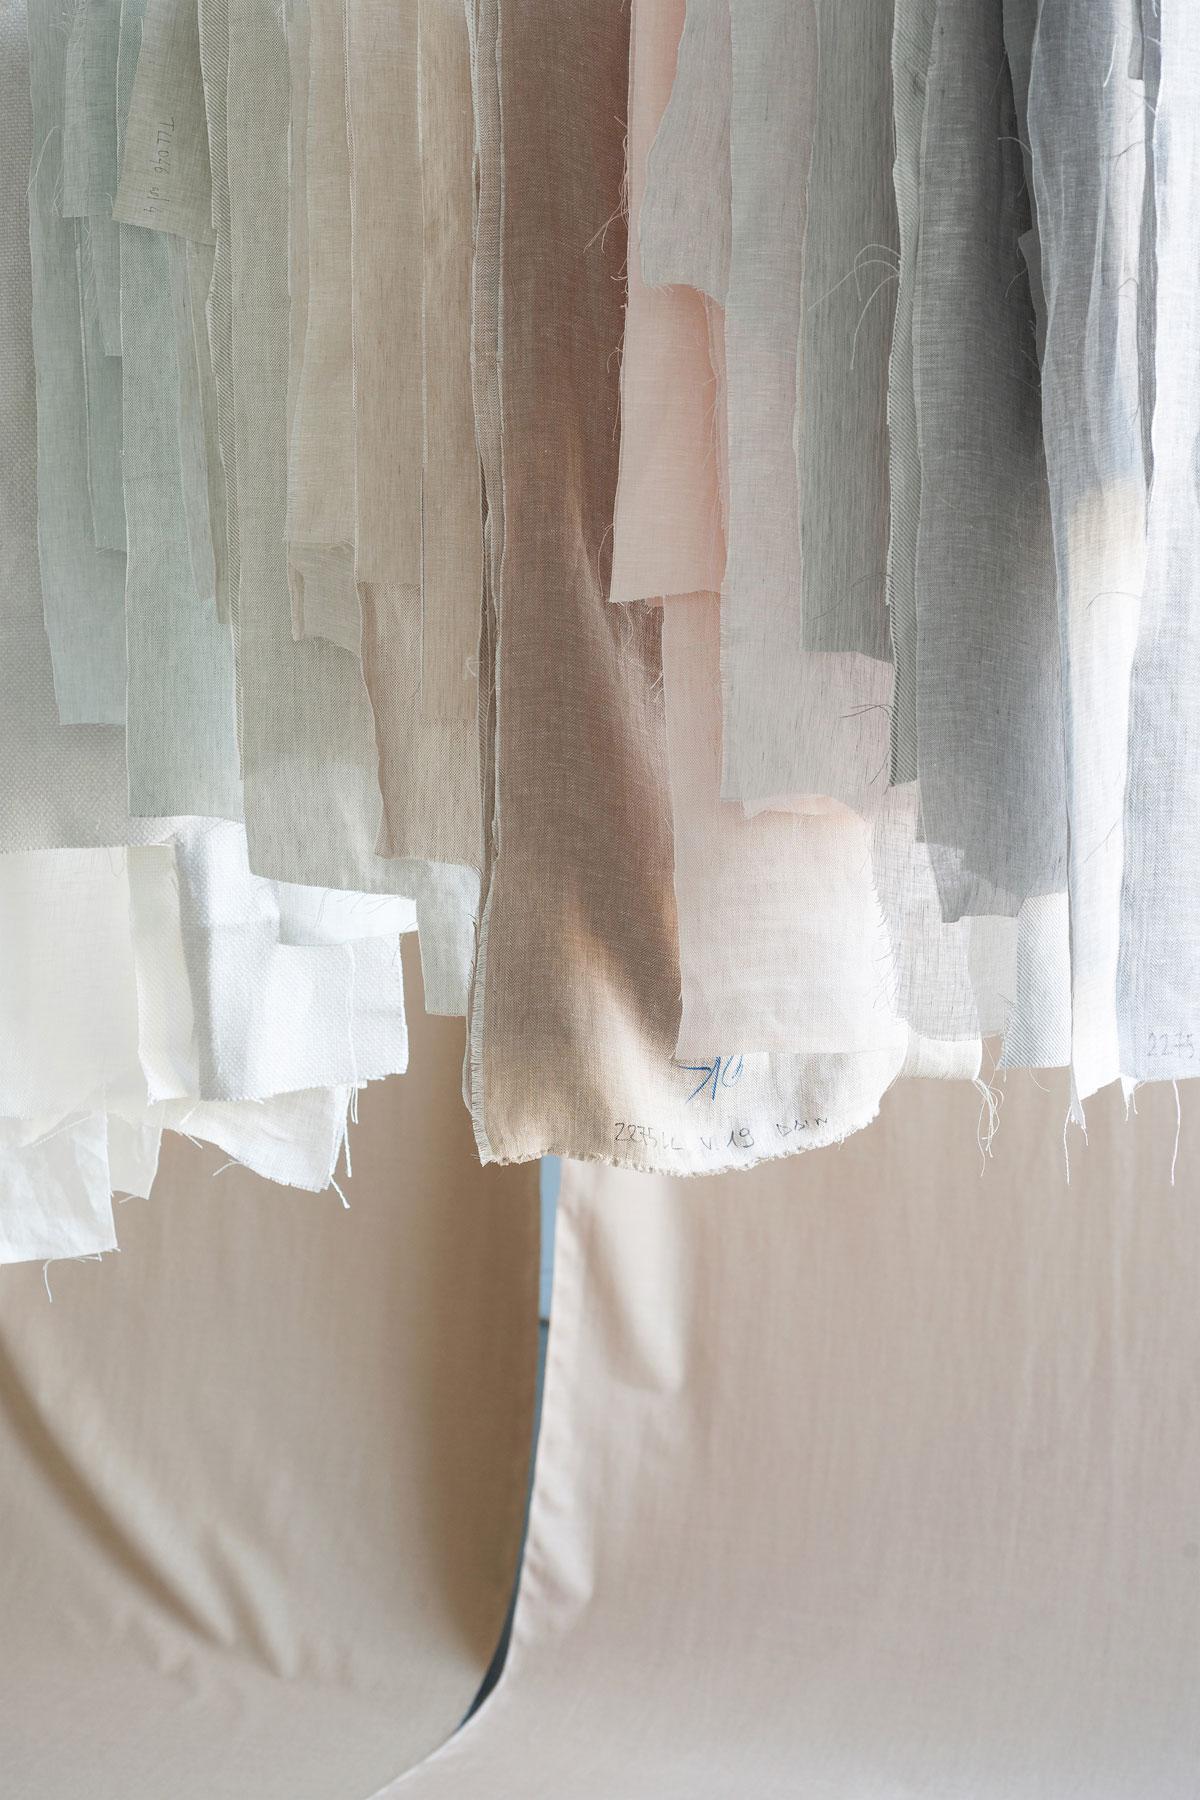 Linen anthology, © Andrea Ferrari